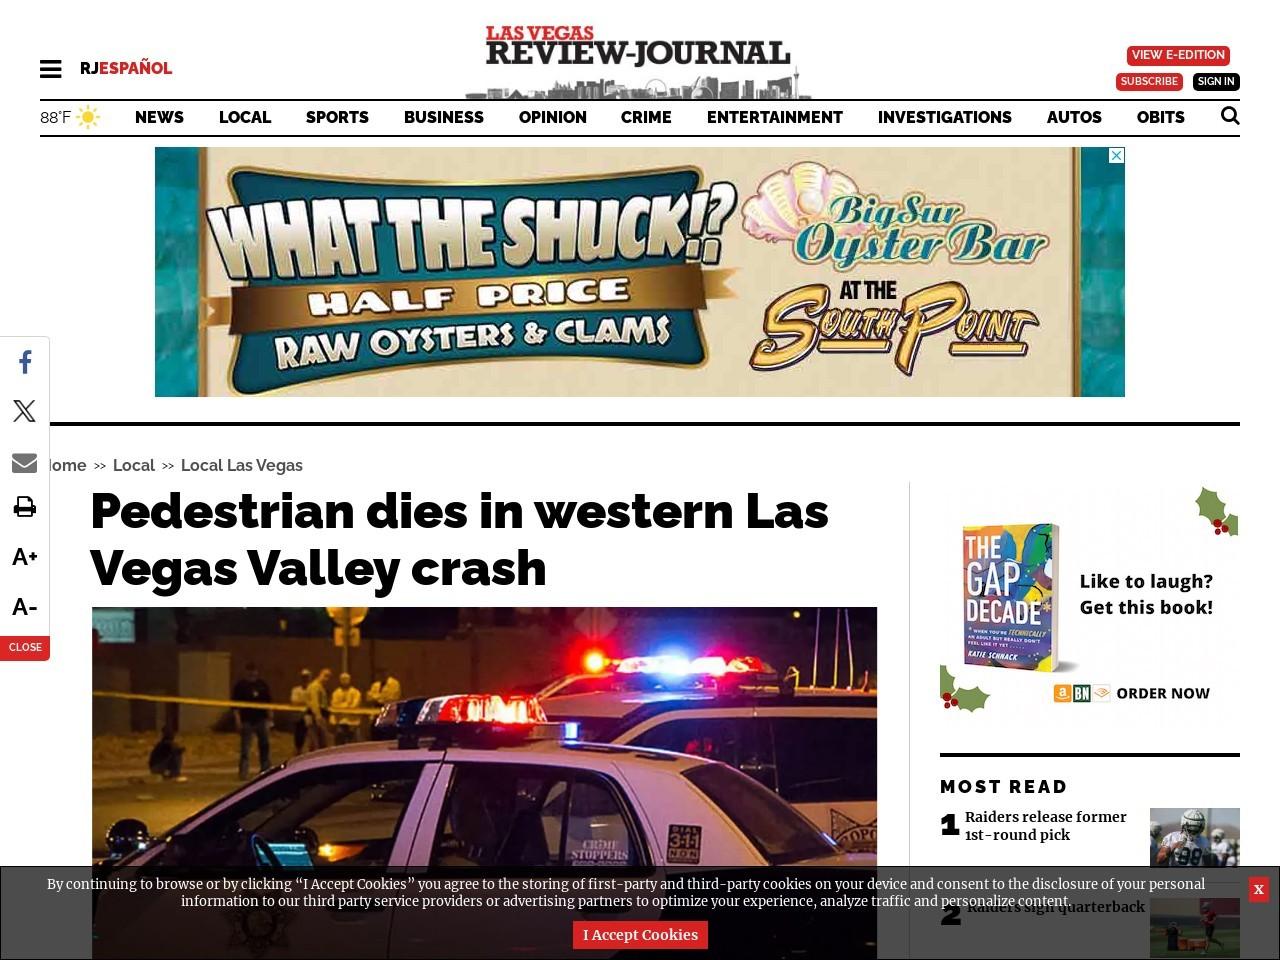 Pedestrian dies in western Las Vegas Valley crash